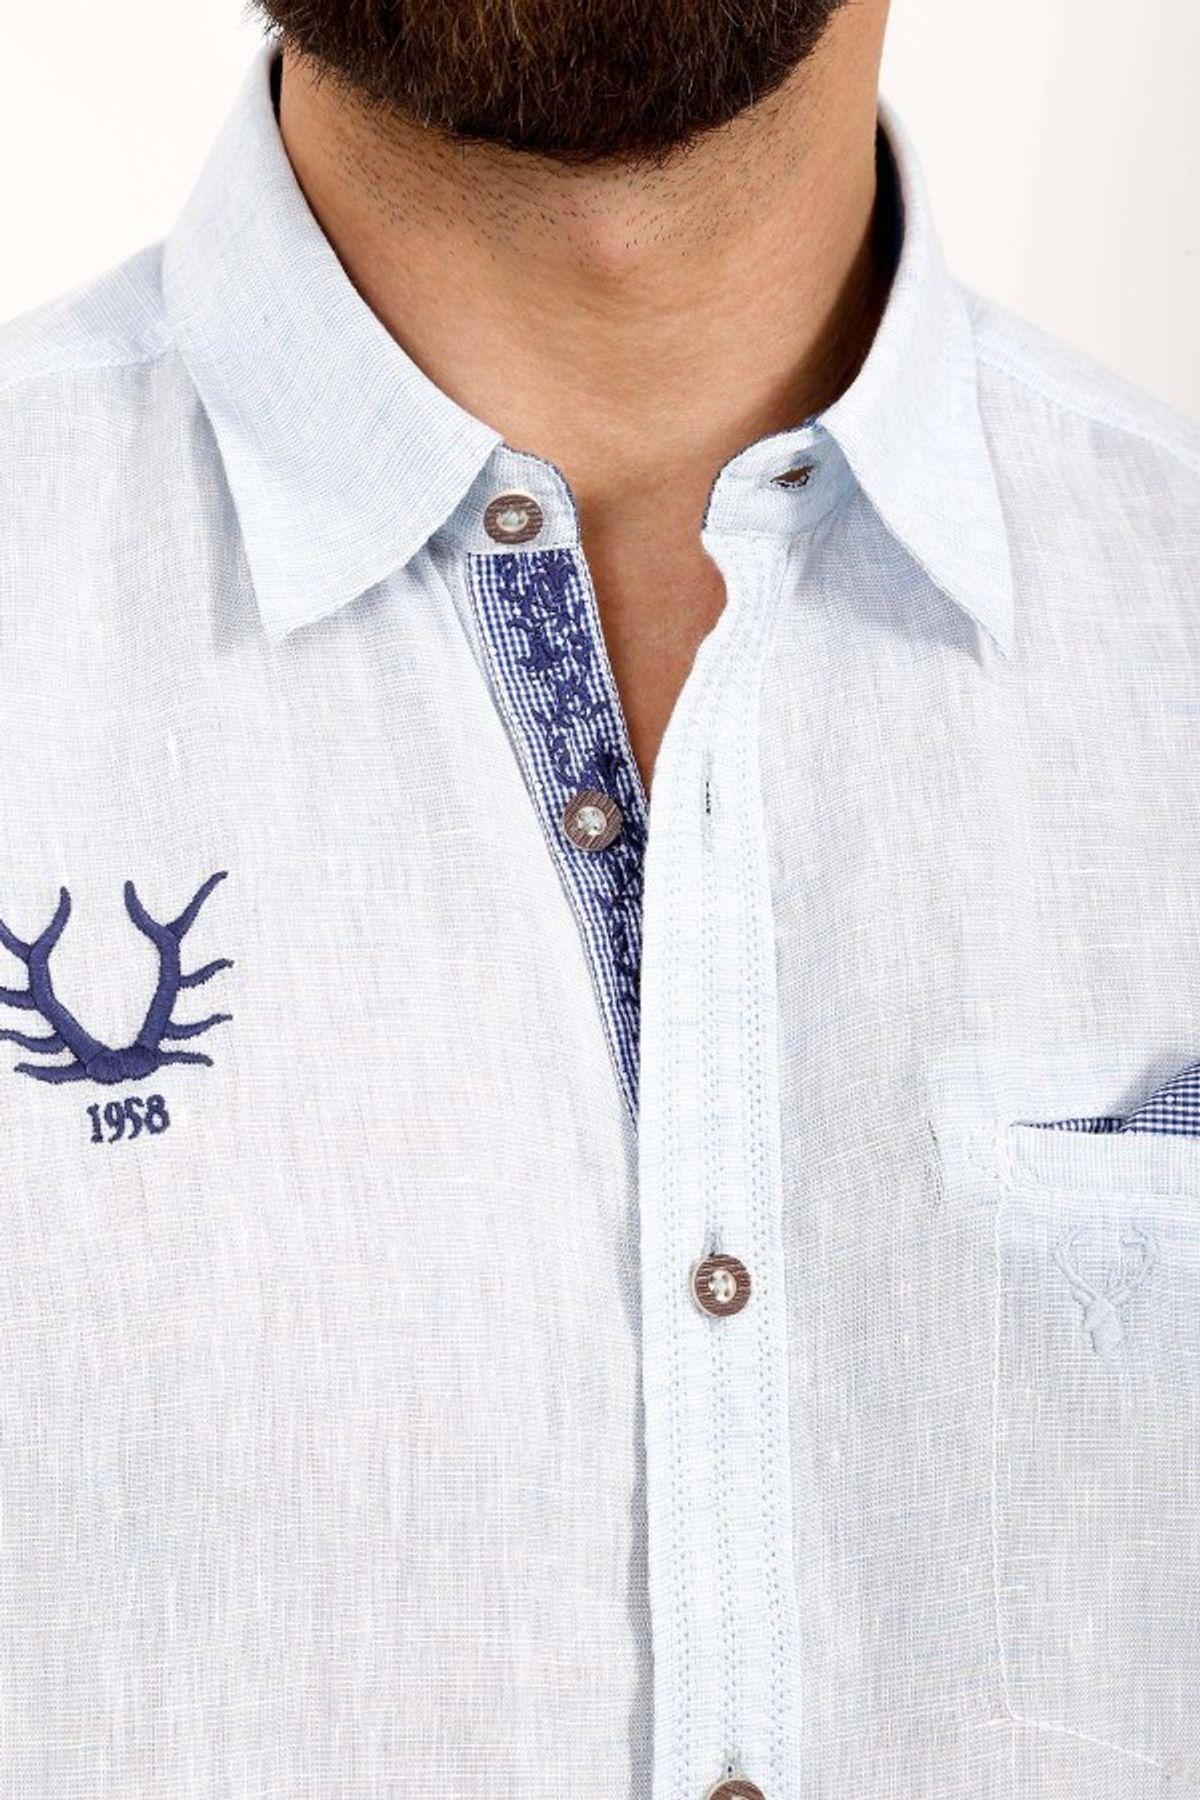 Krüger - Herren Trachtenhemd in blau, Finn (95108-81) – Bild 6